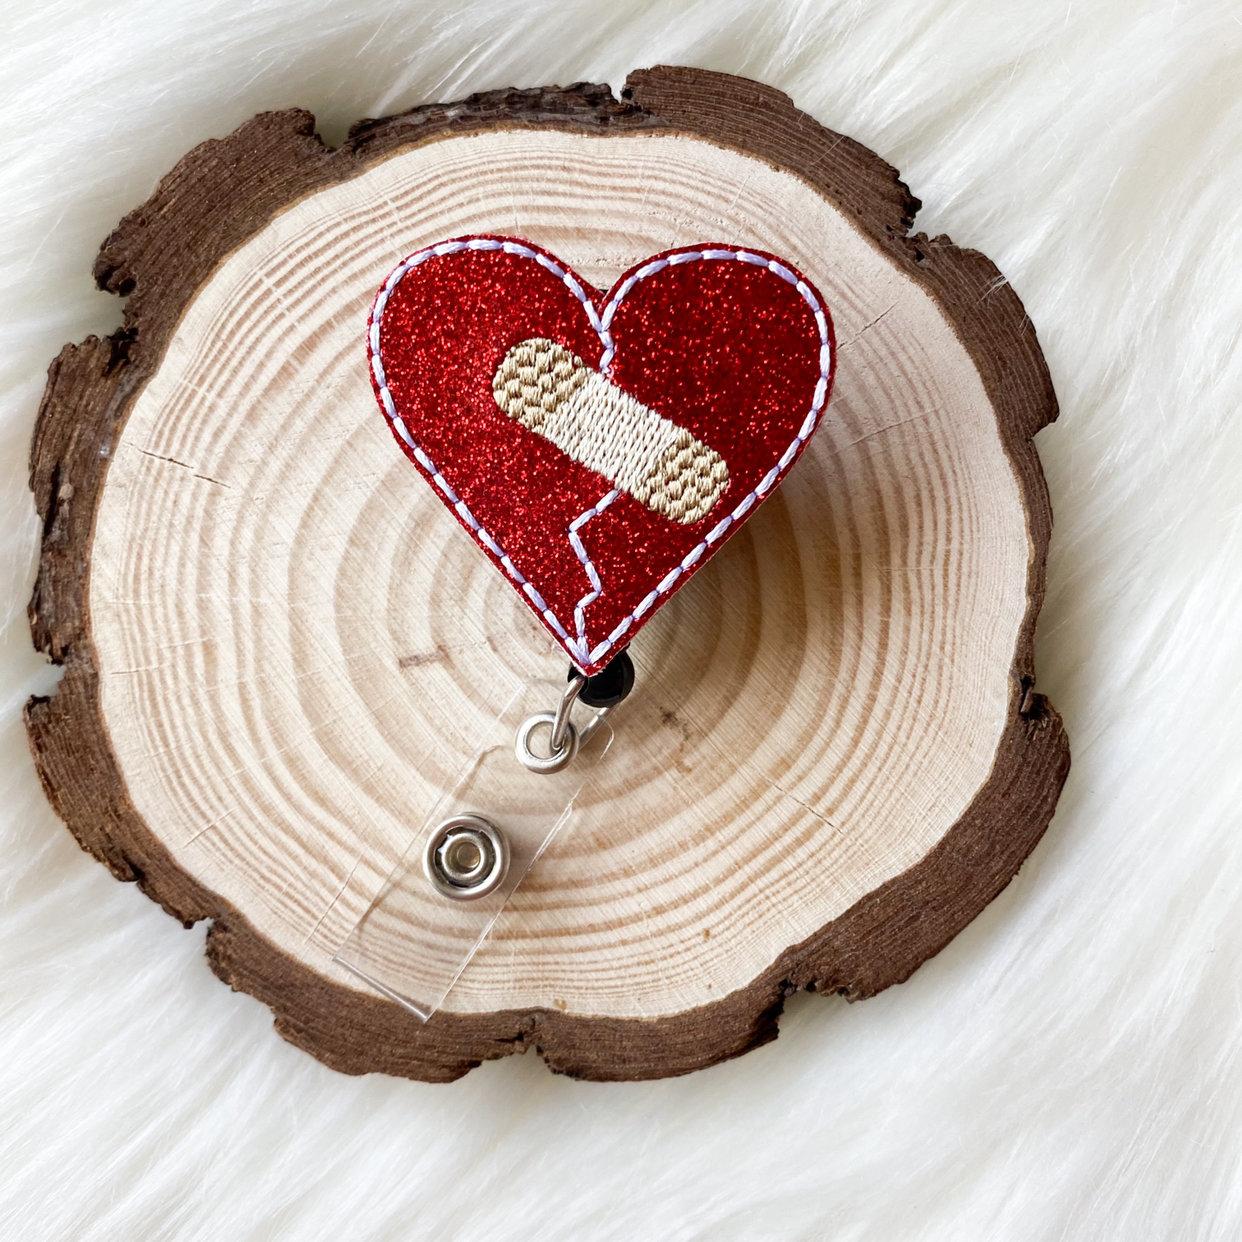 Mended Heart Badge Reel